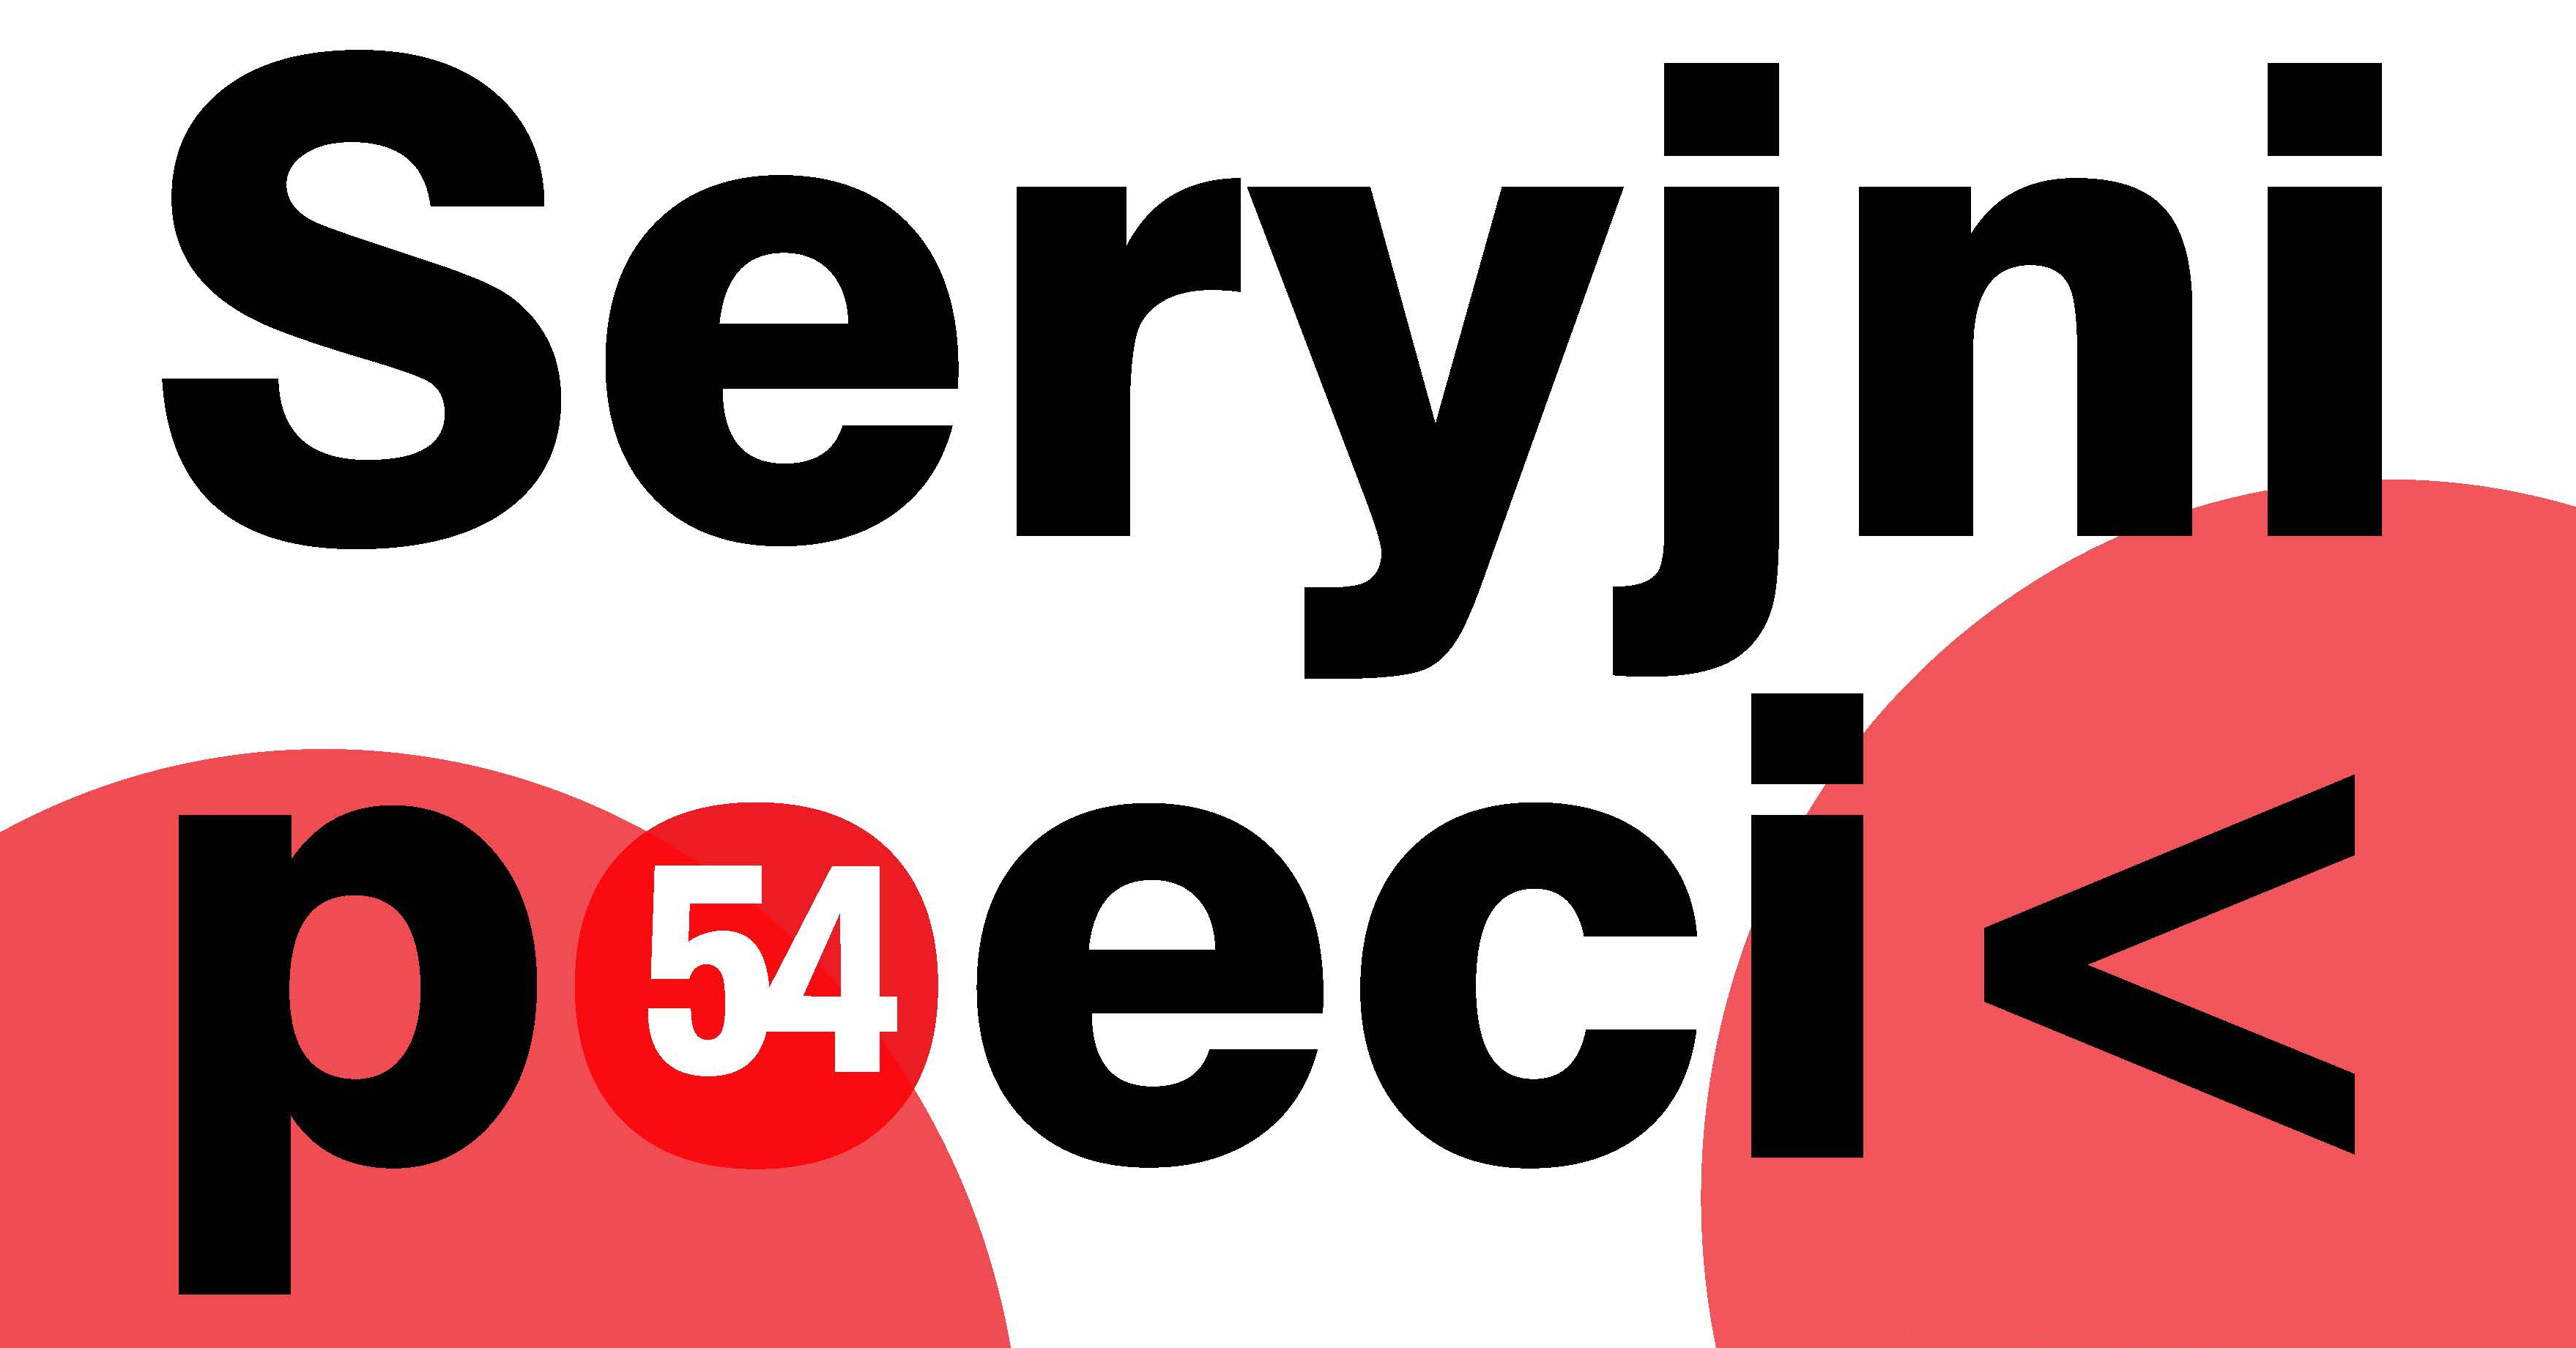 Seryjni_54